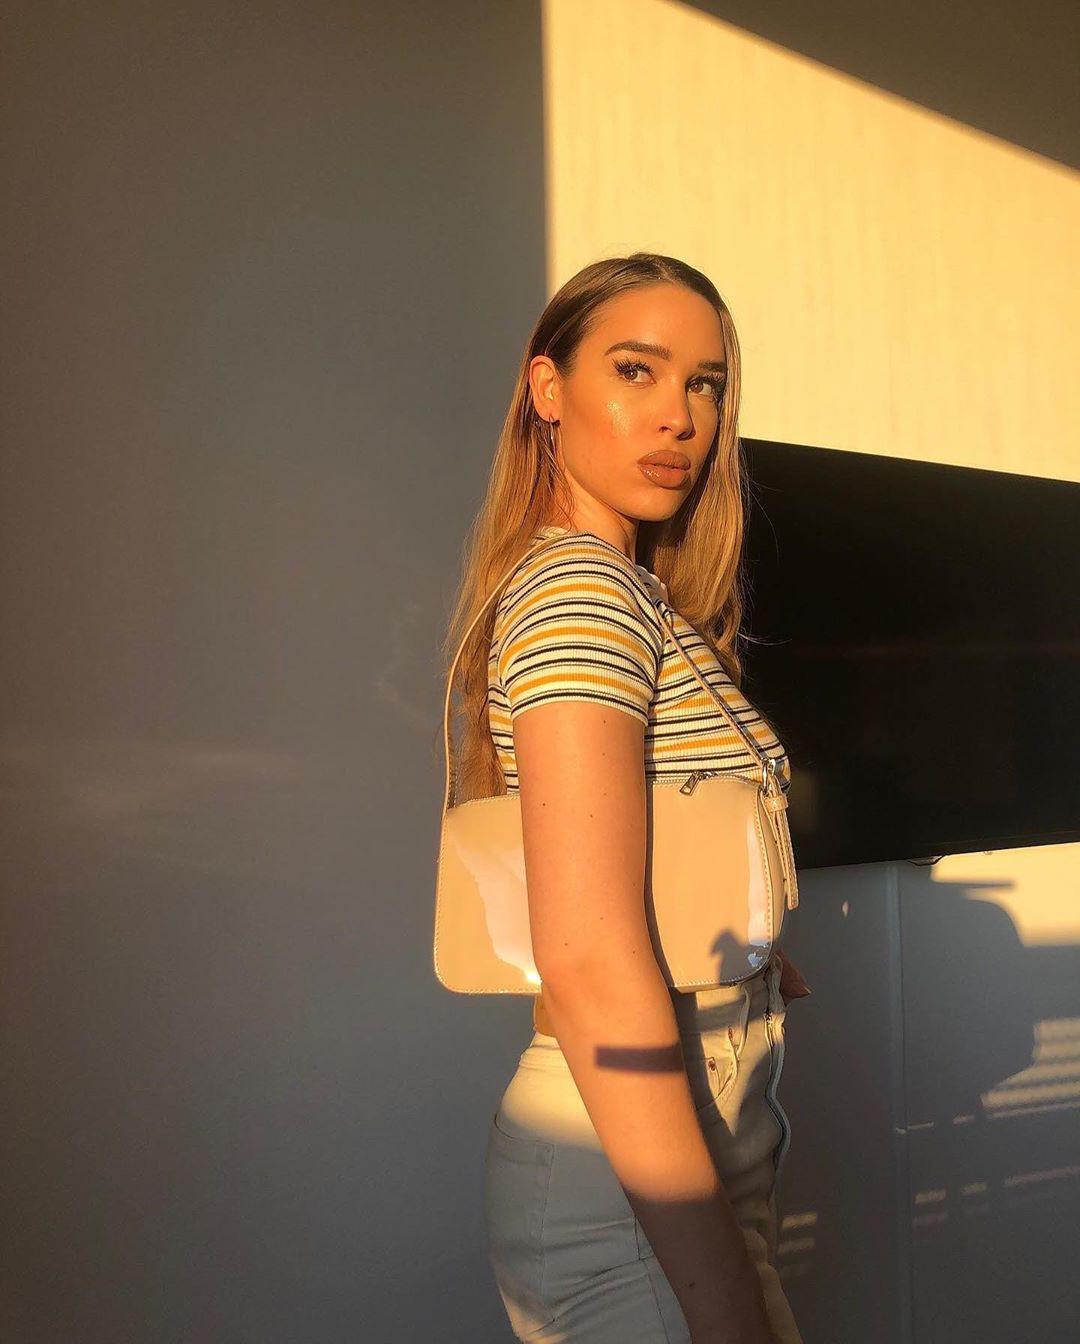 Isabelle Tounsi legs photo, Long Hair Girl, wardrobe ideas